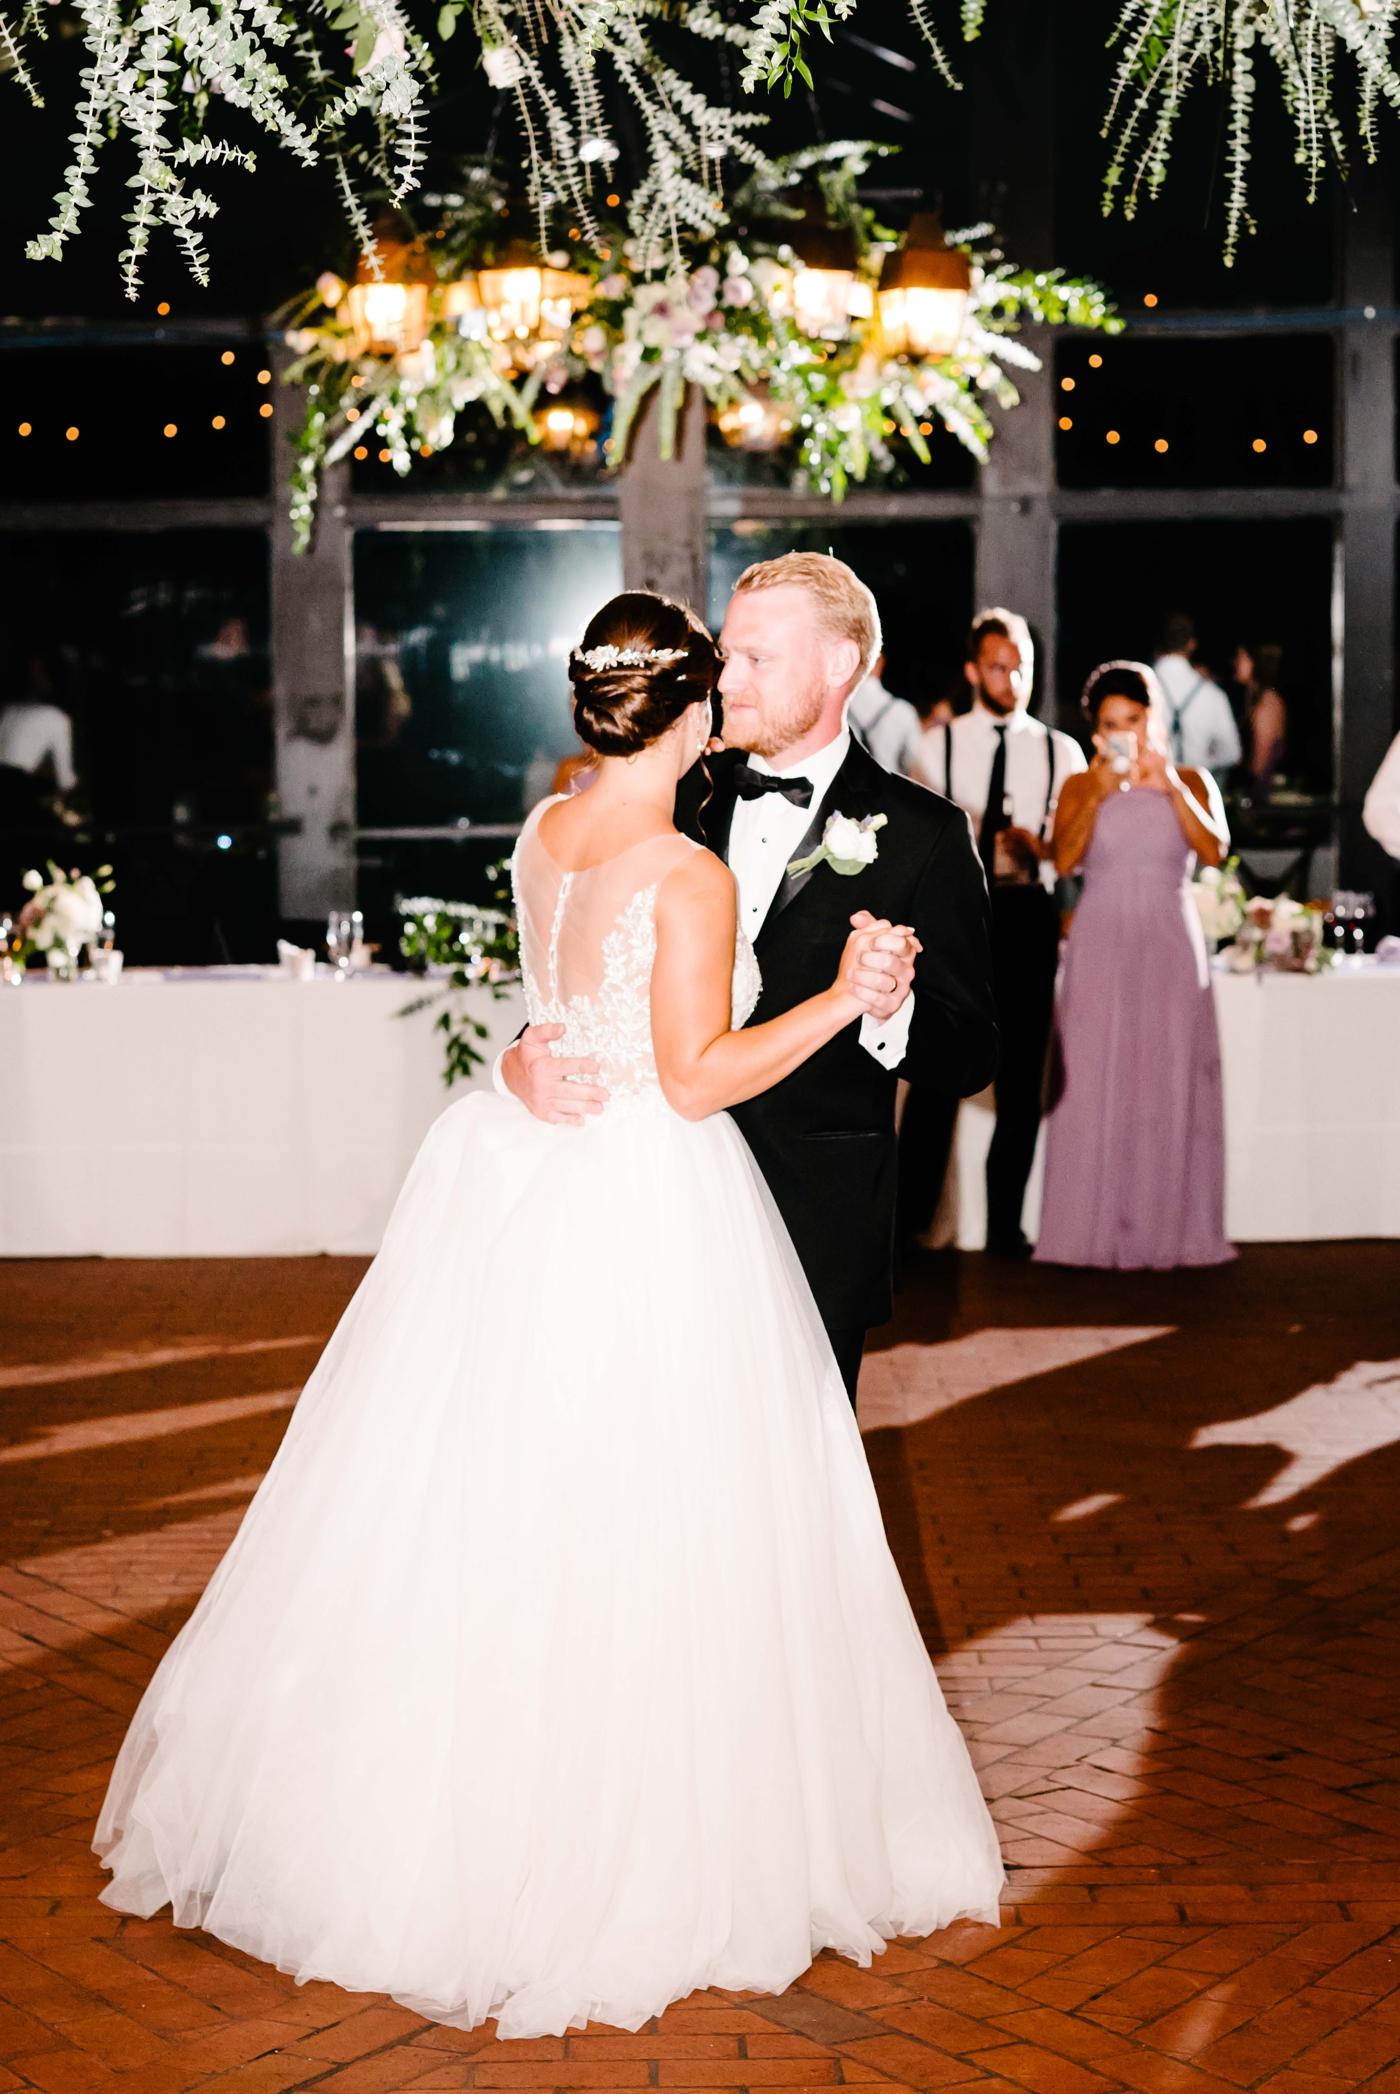 chicago-fine-art-wedding-photography-zuidema52